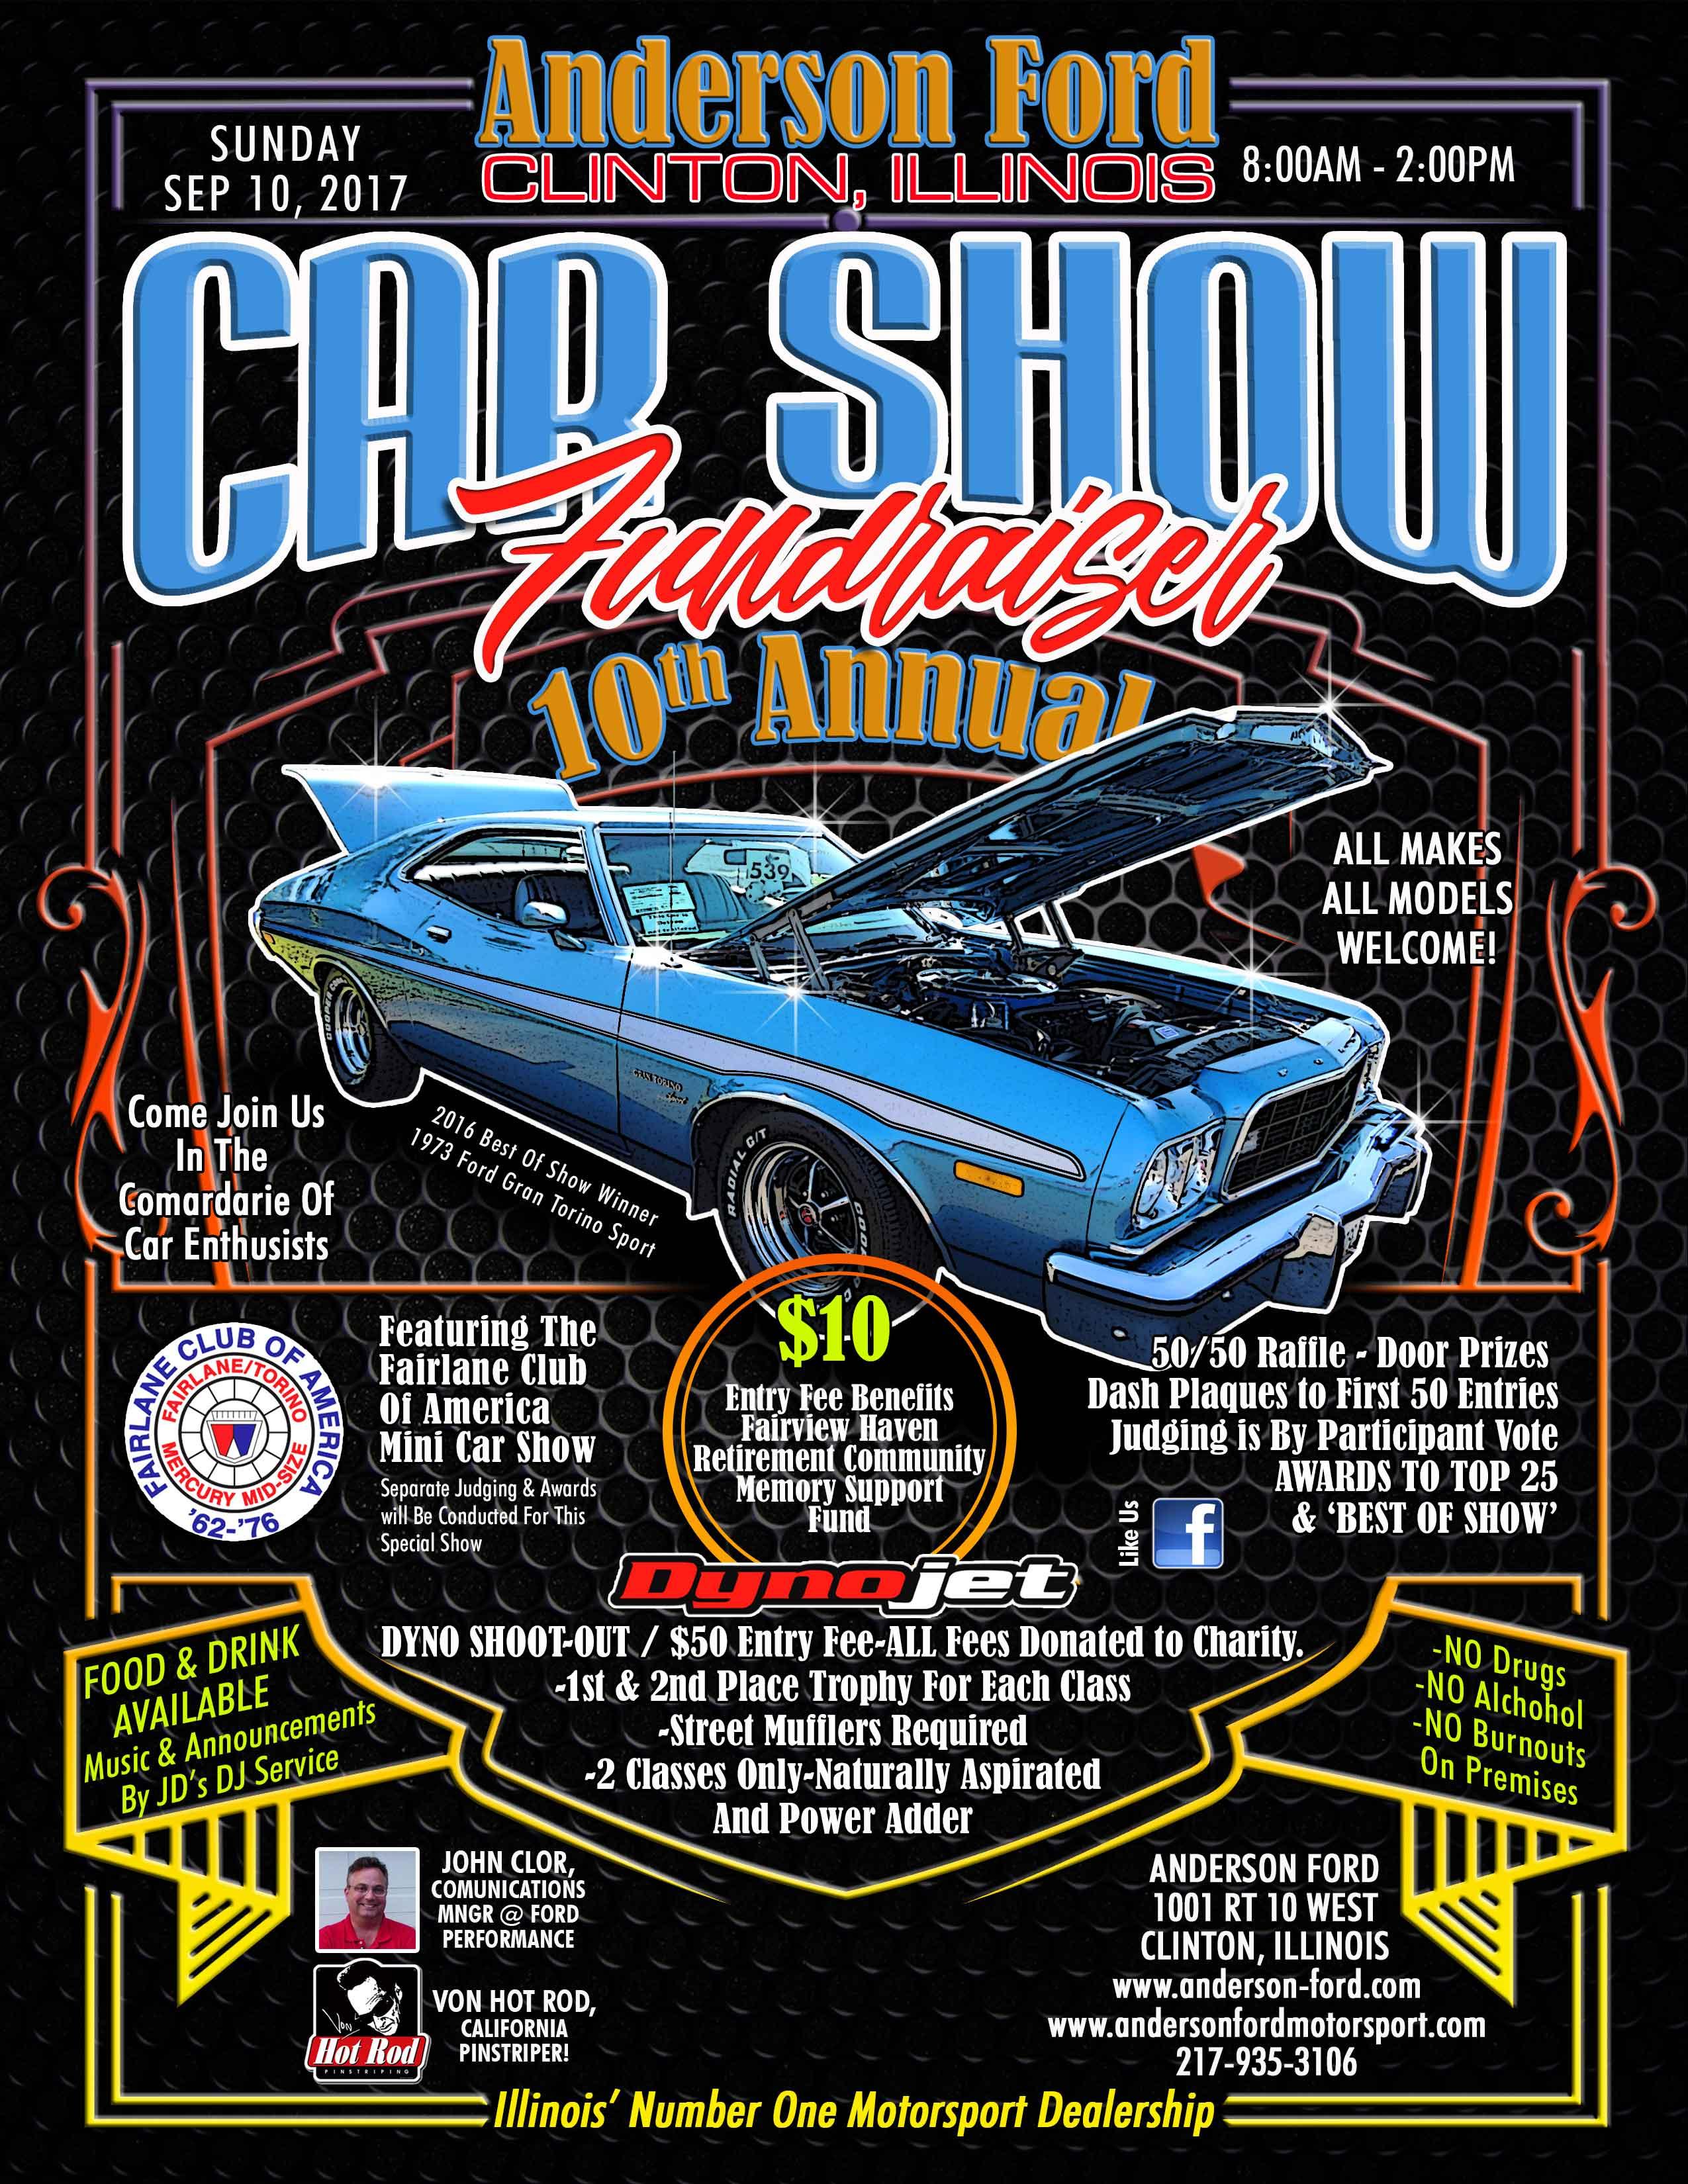 Mustang Club Of America >> Anderson Ford 10th Annual Car Show | Car Show Radar